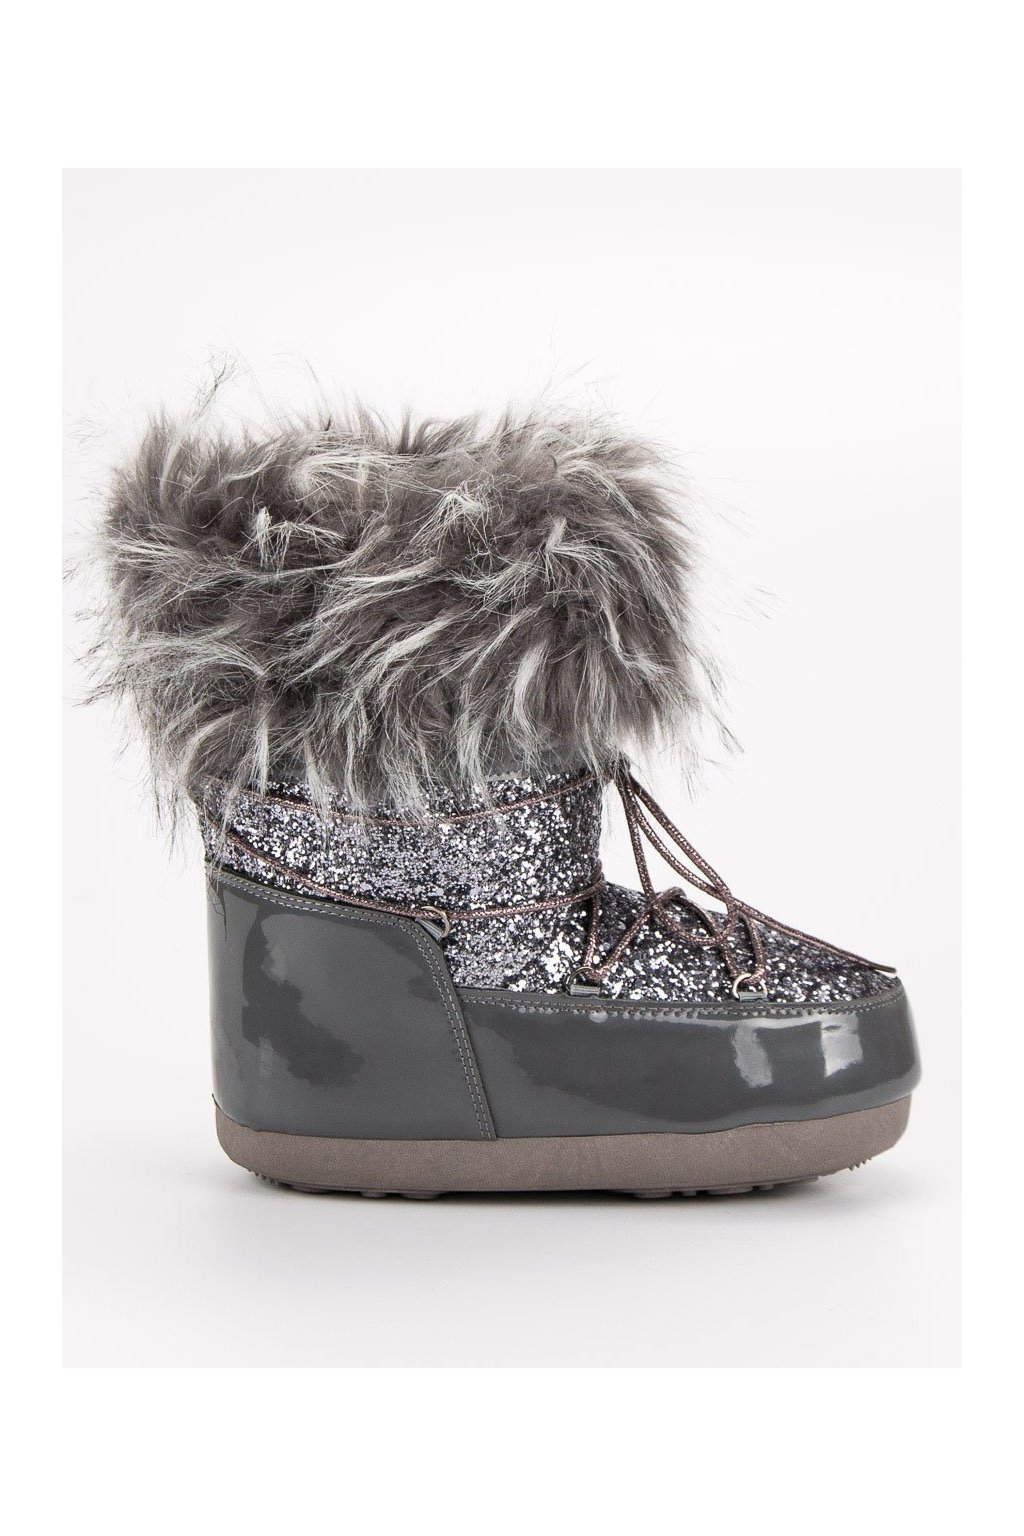 57ebc5f6bb20 Dámska obuv - Topánky